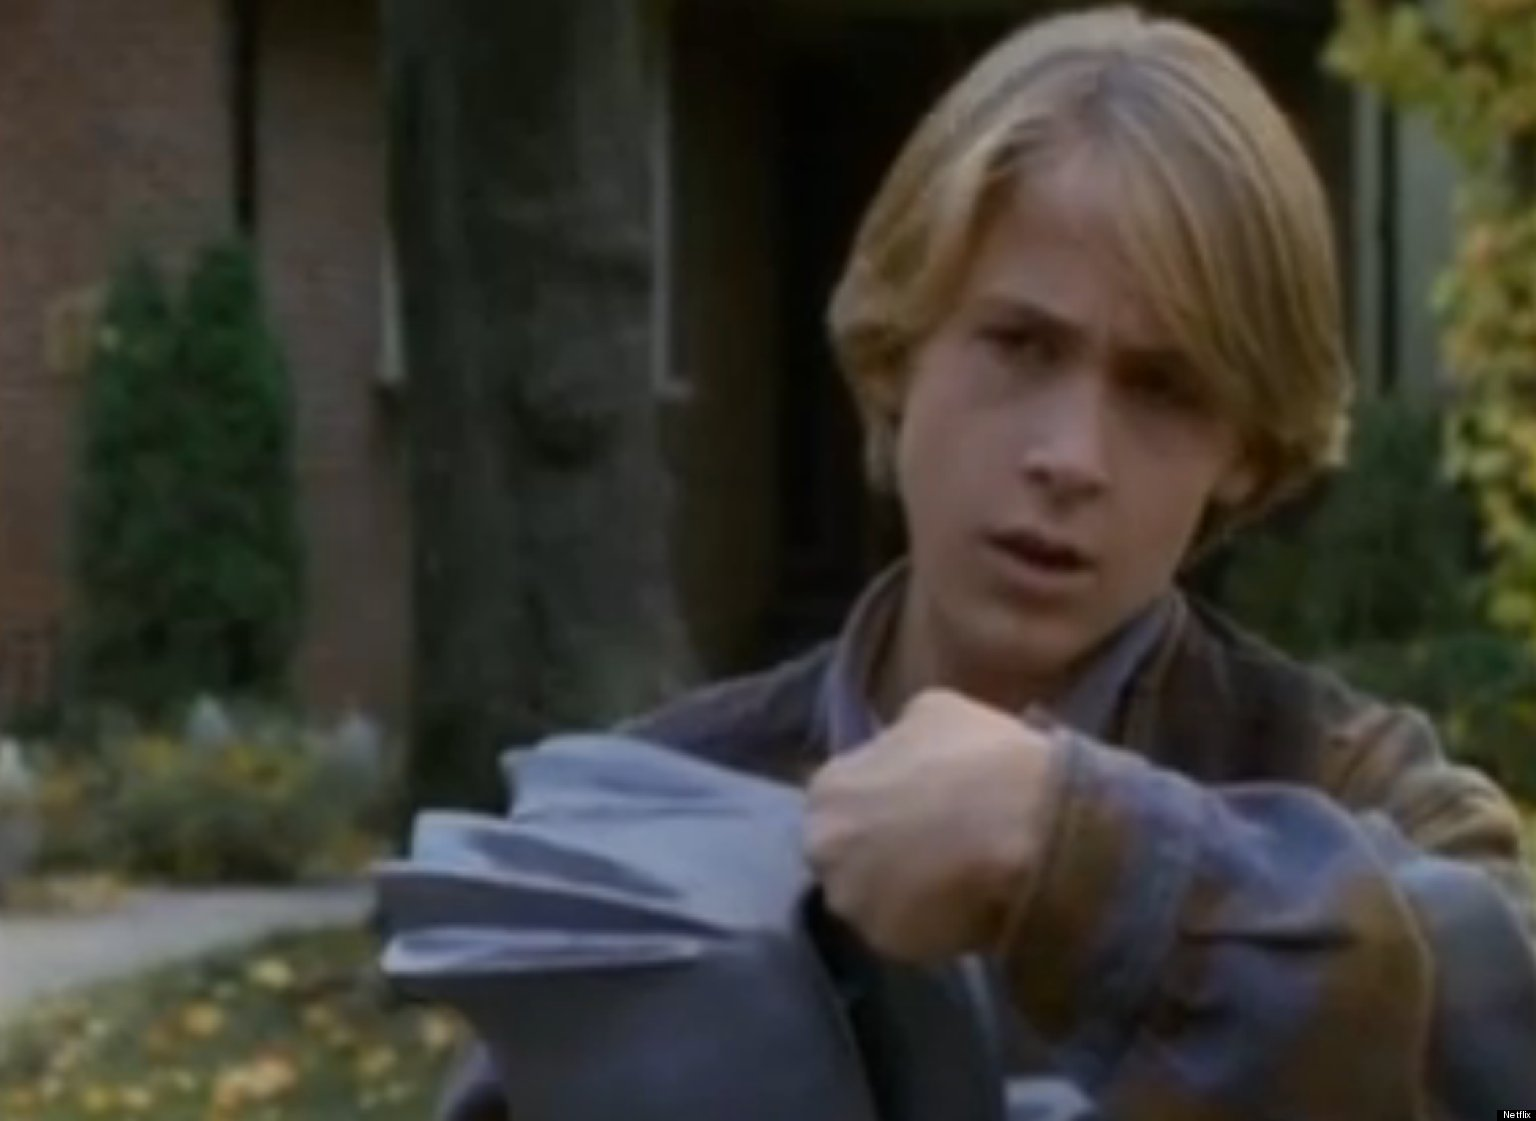 Ryan Gosling In Goosebumps Video Is Adorable As Ever